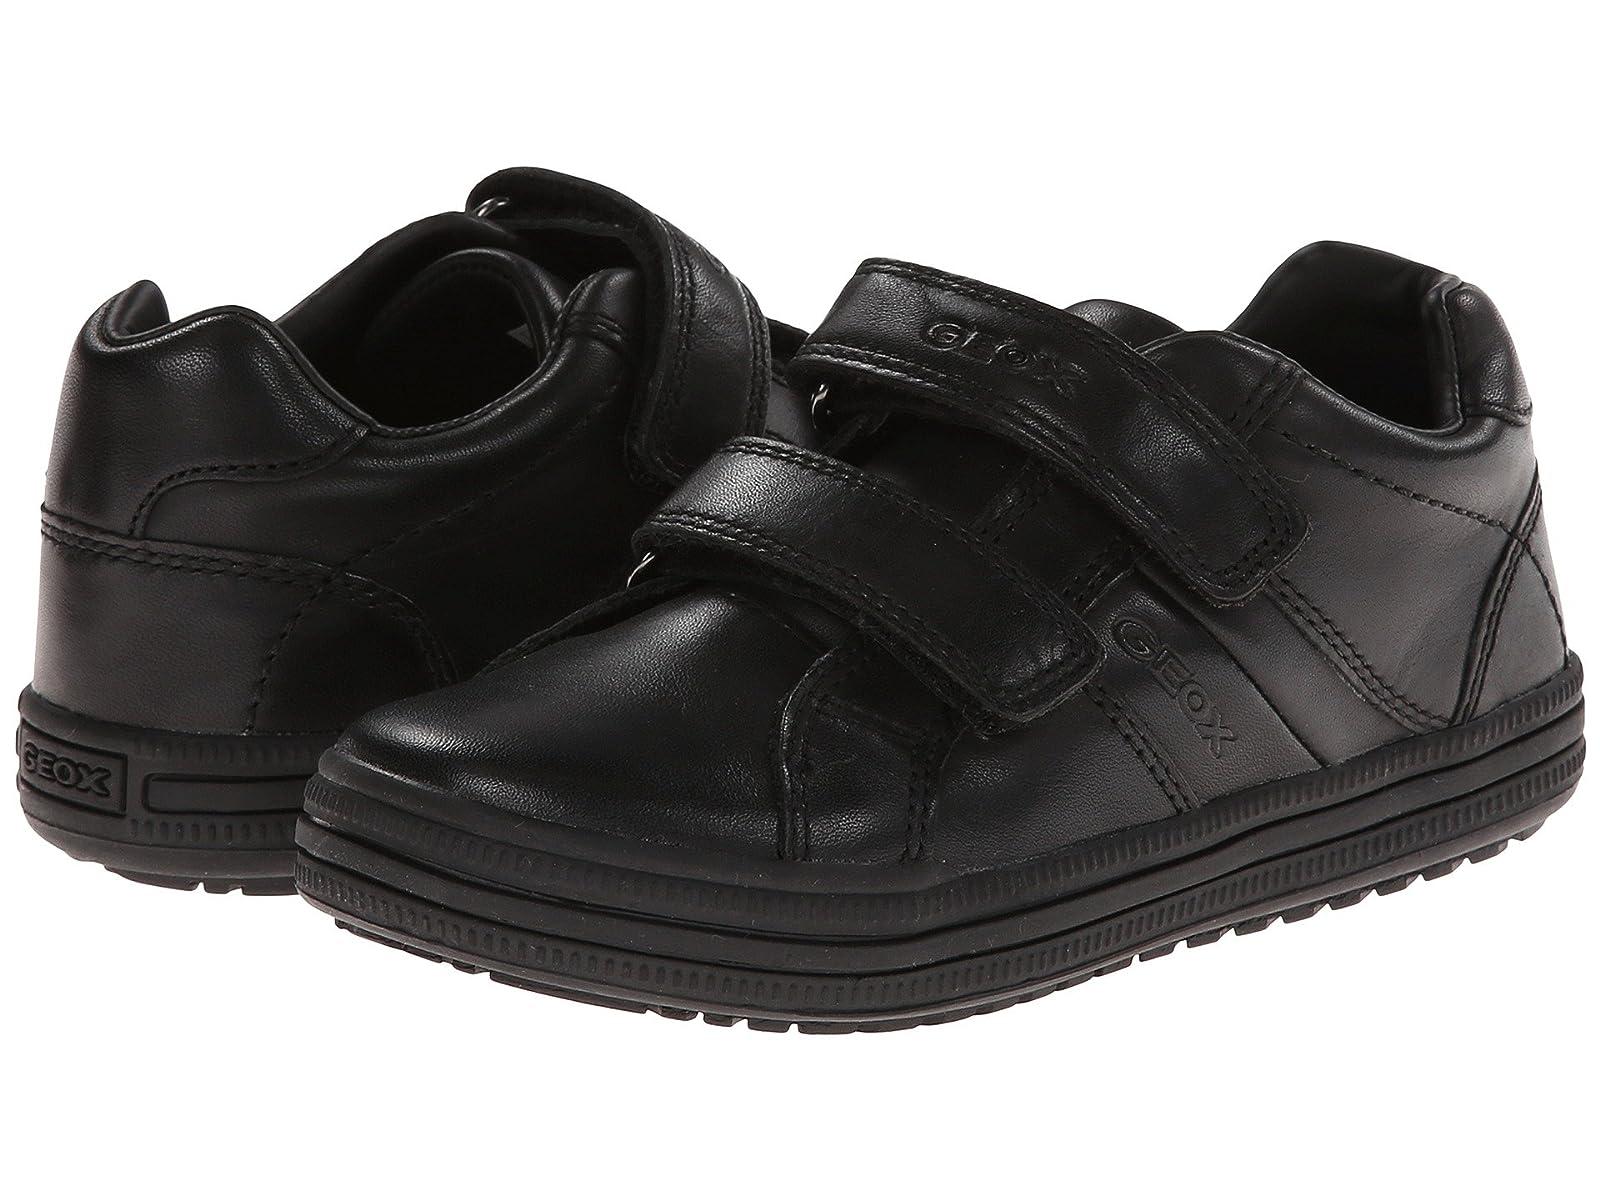 Geox Kids Jr Elvis Uniform (Little Kid)Atmospheric grades have affordable shoes